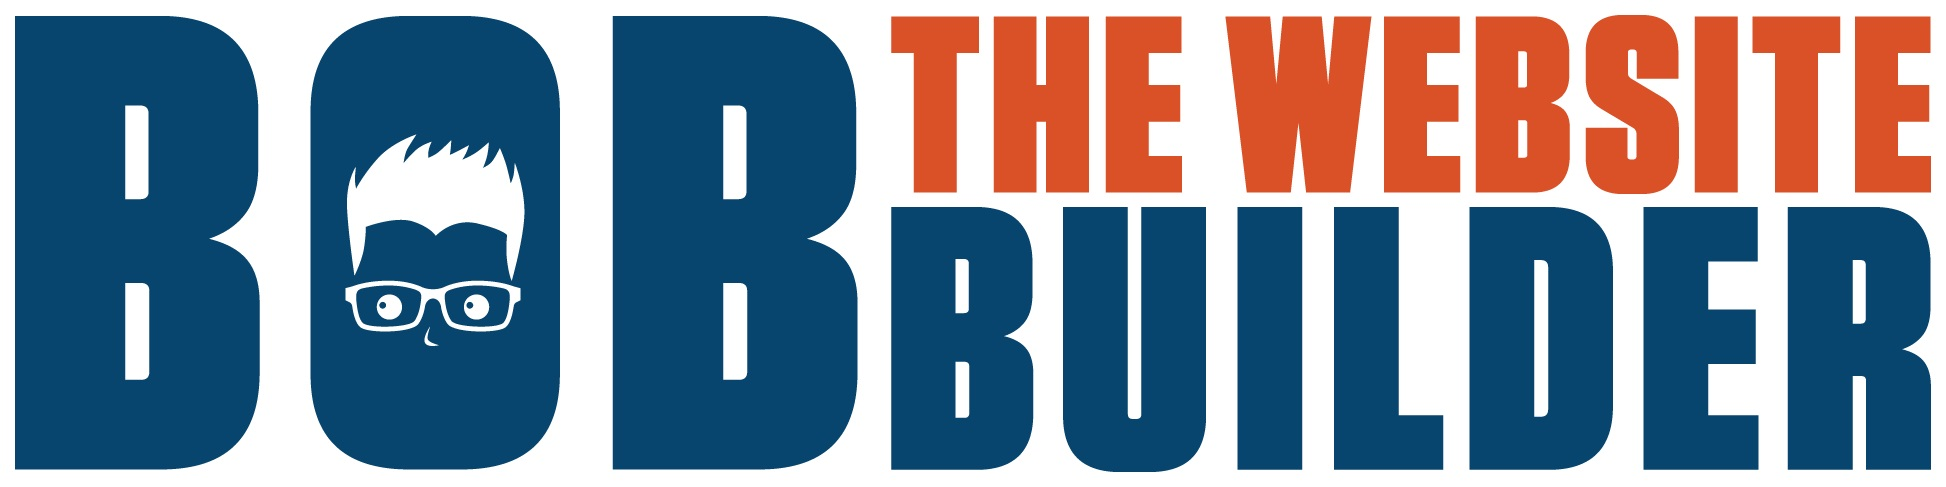 Bob The Website Builder: Domain & Hosting Services